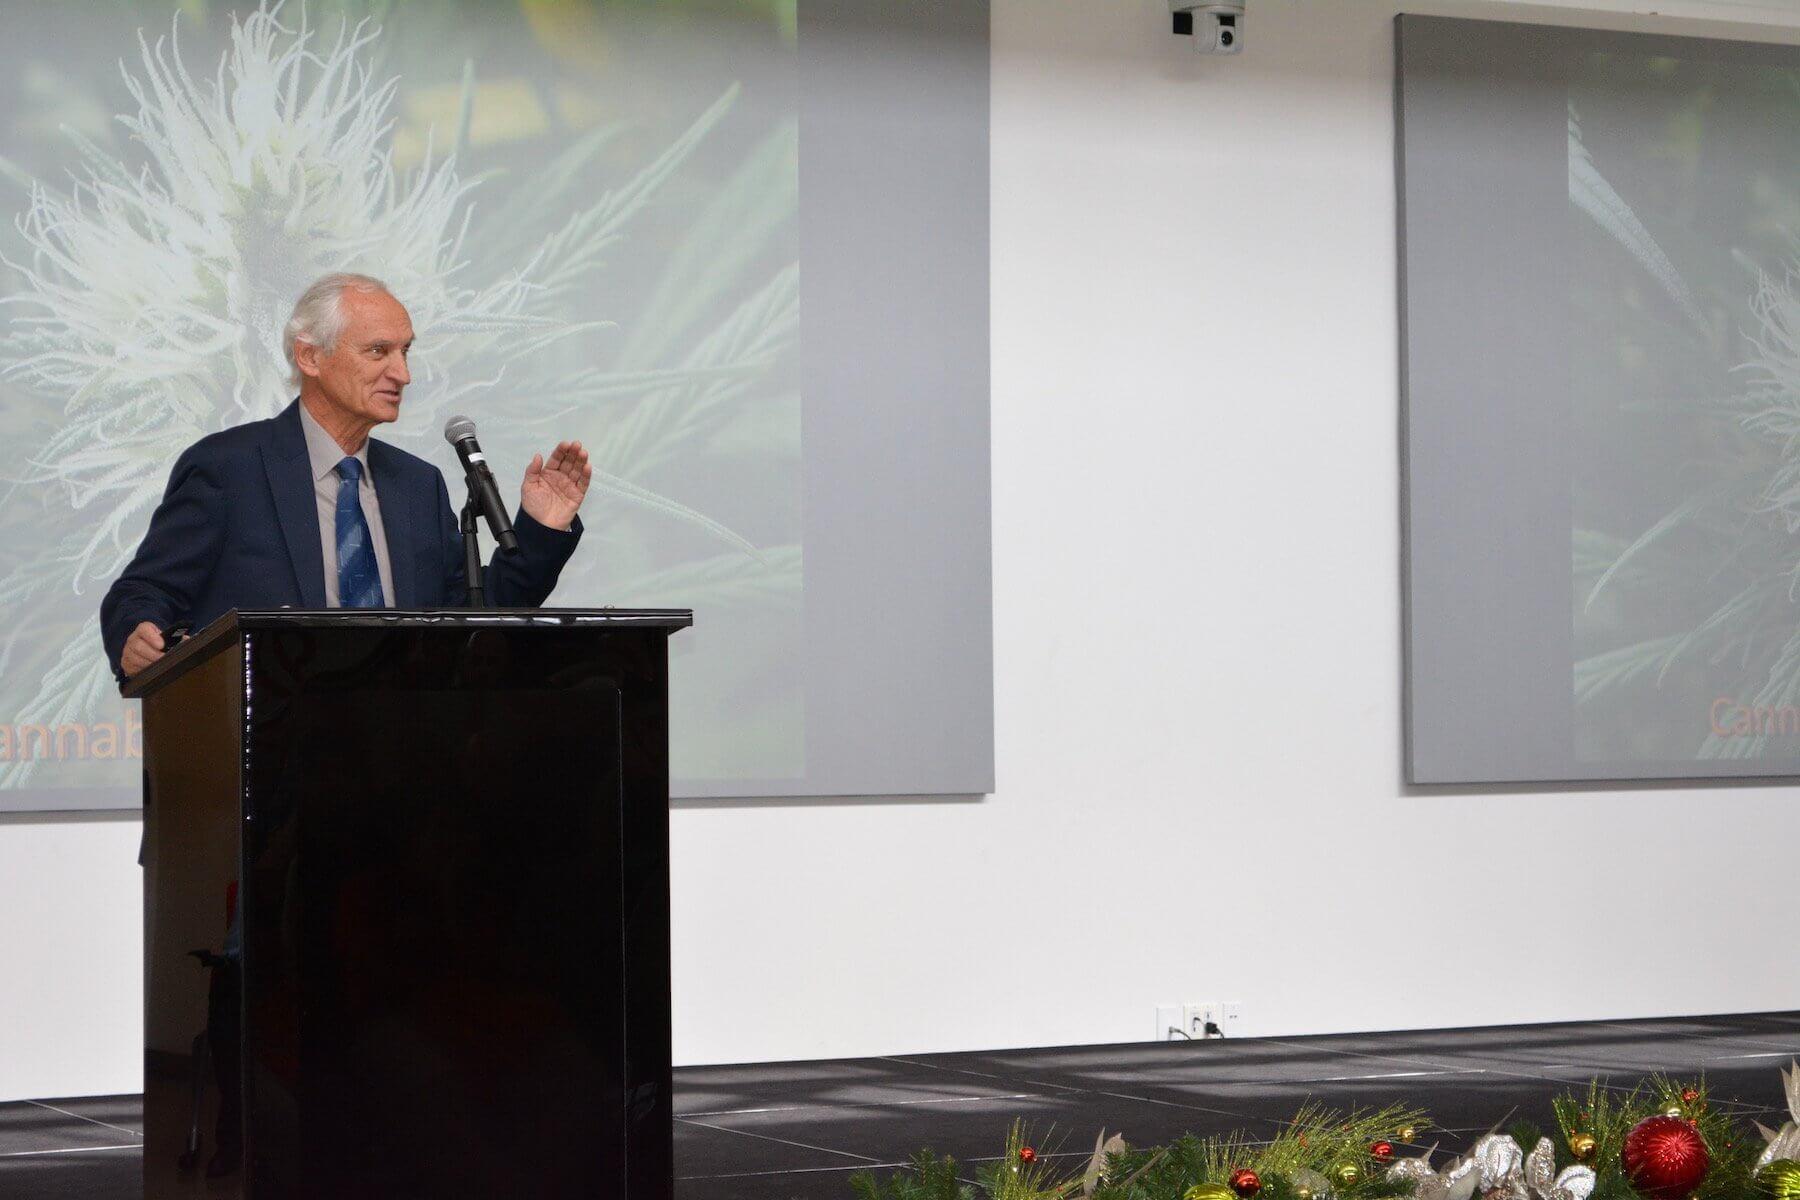 Keynote speaker Lumir Hanus, Ph.D., is a research fellow at the Hebrew University in Jerusalem, Israel.